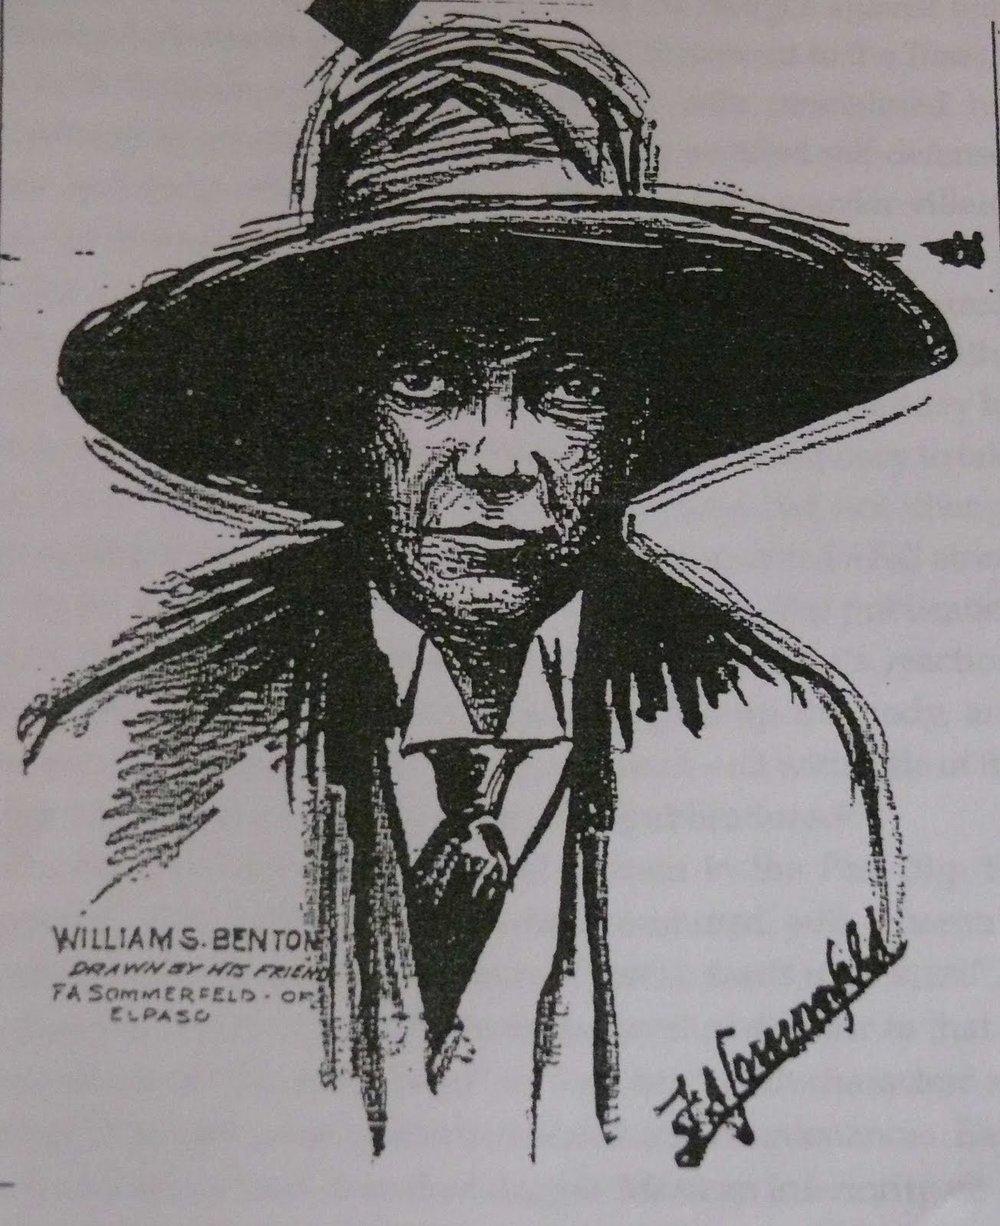 William S. Benton drawn by Felix A. Sommerfeld